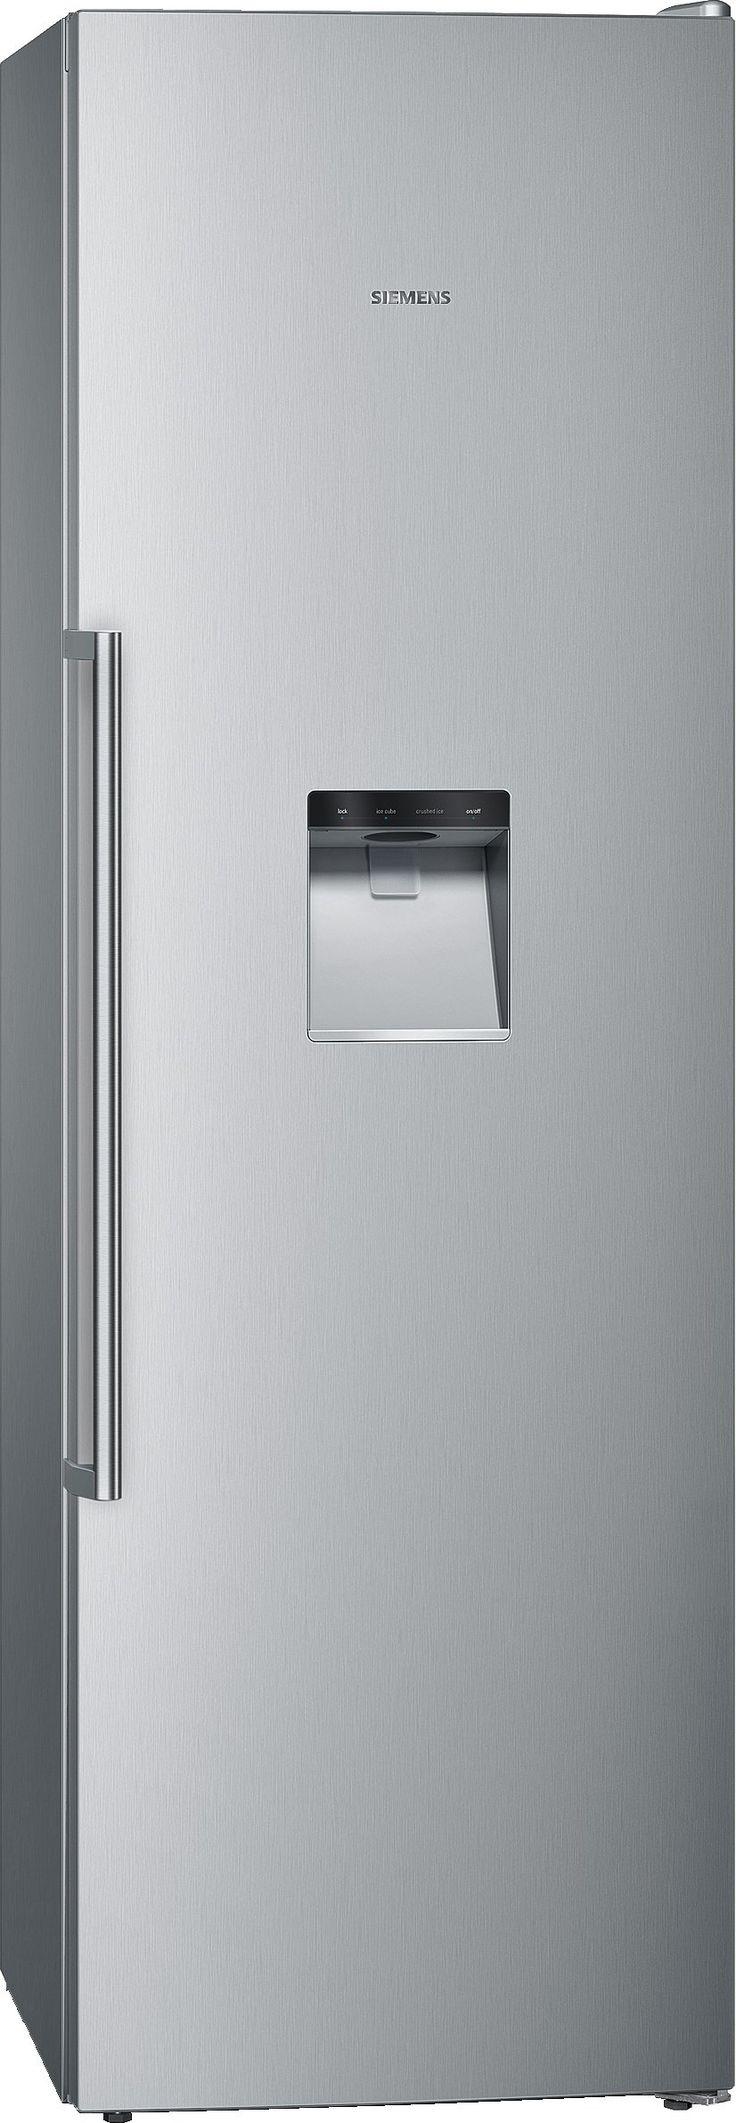 Siemens GS36DPI20 Fritstående fryseskab